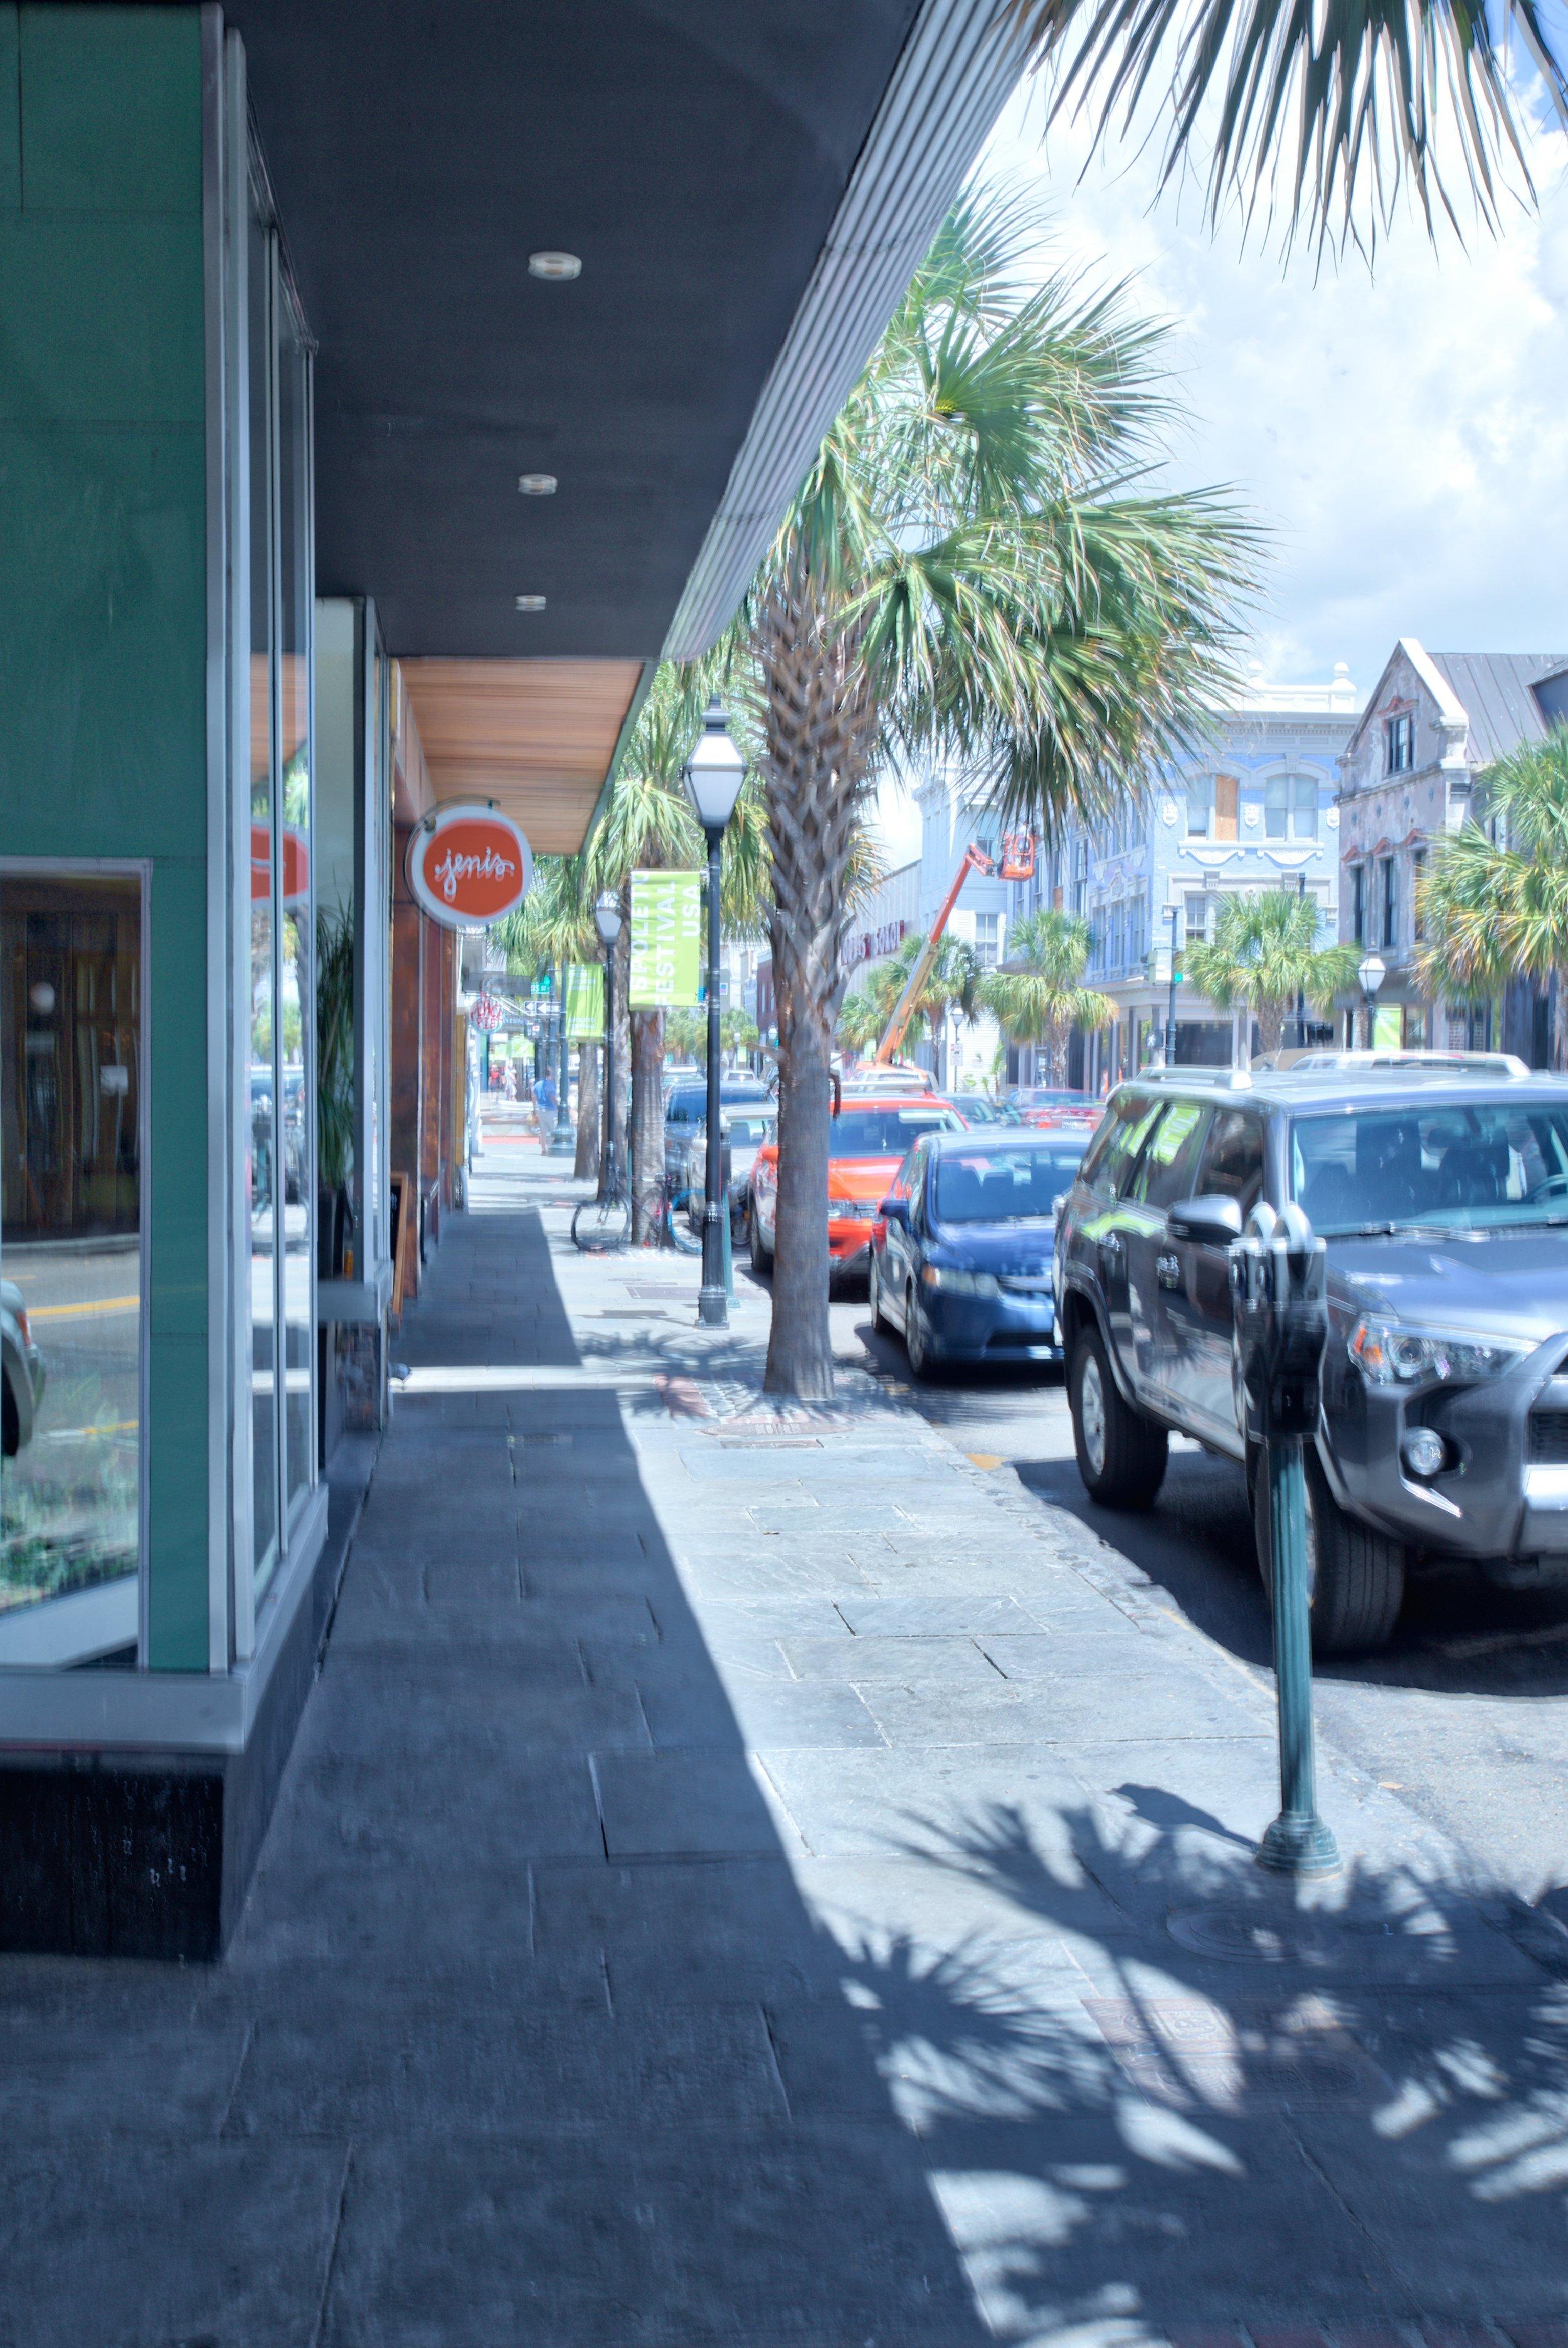 1Charleston SC King Street Shopping and Restaurants Nearby1.jpeg